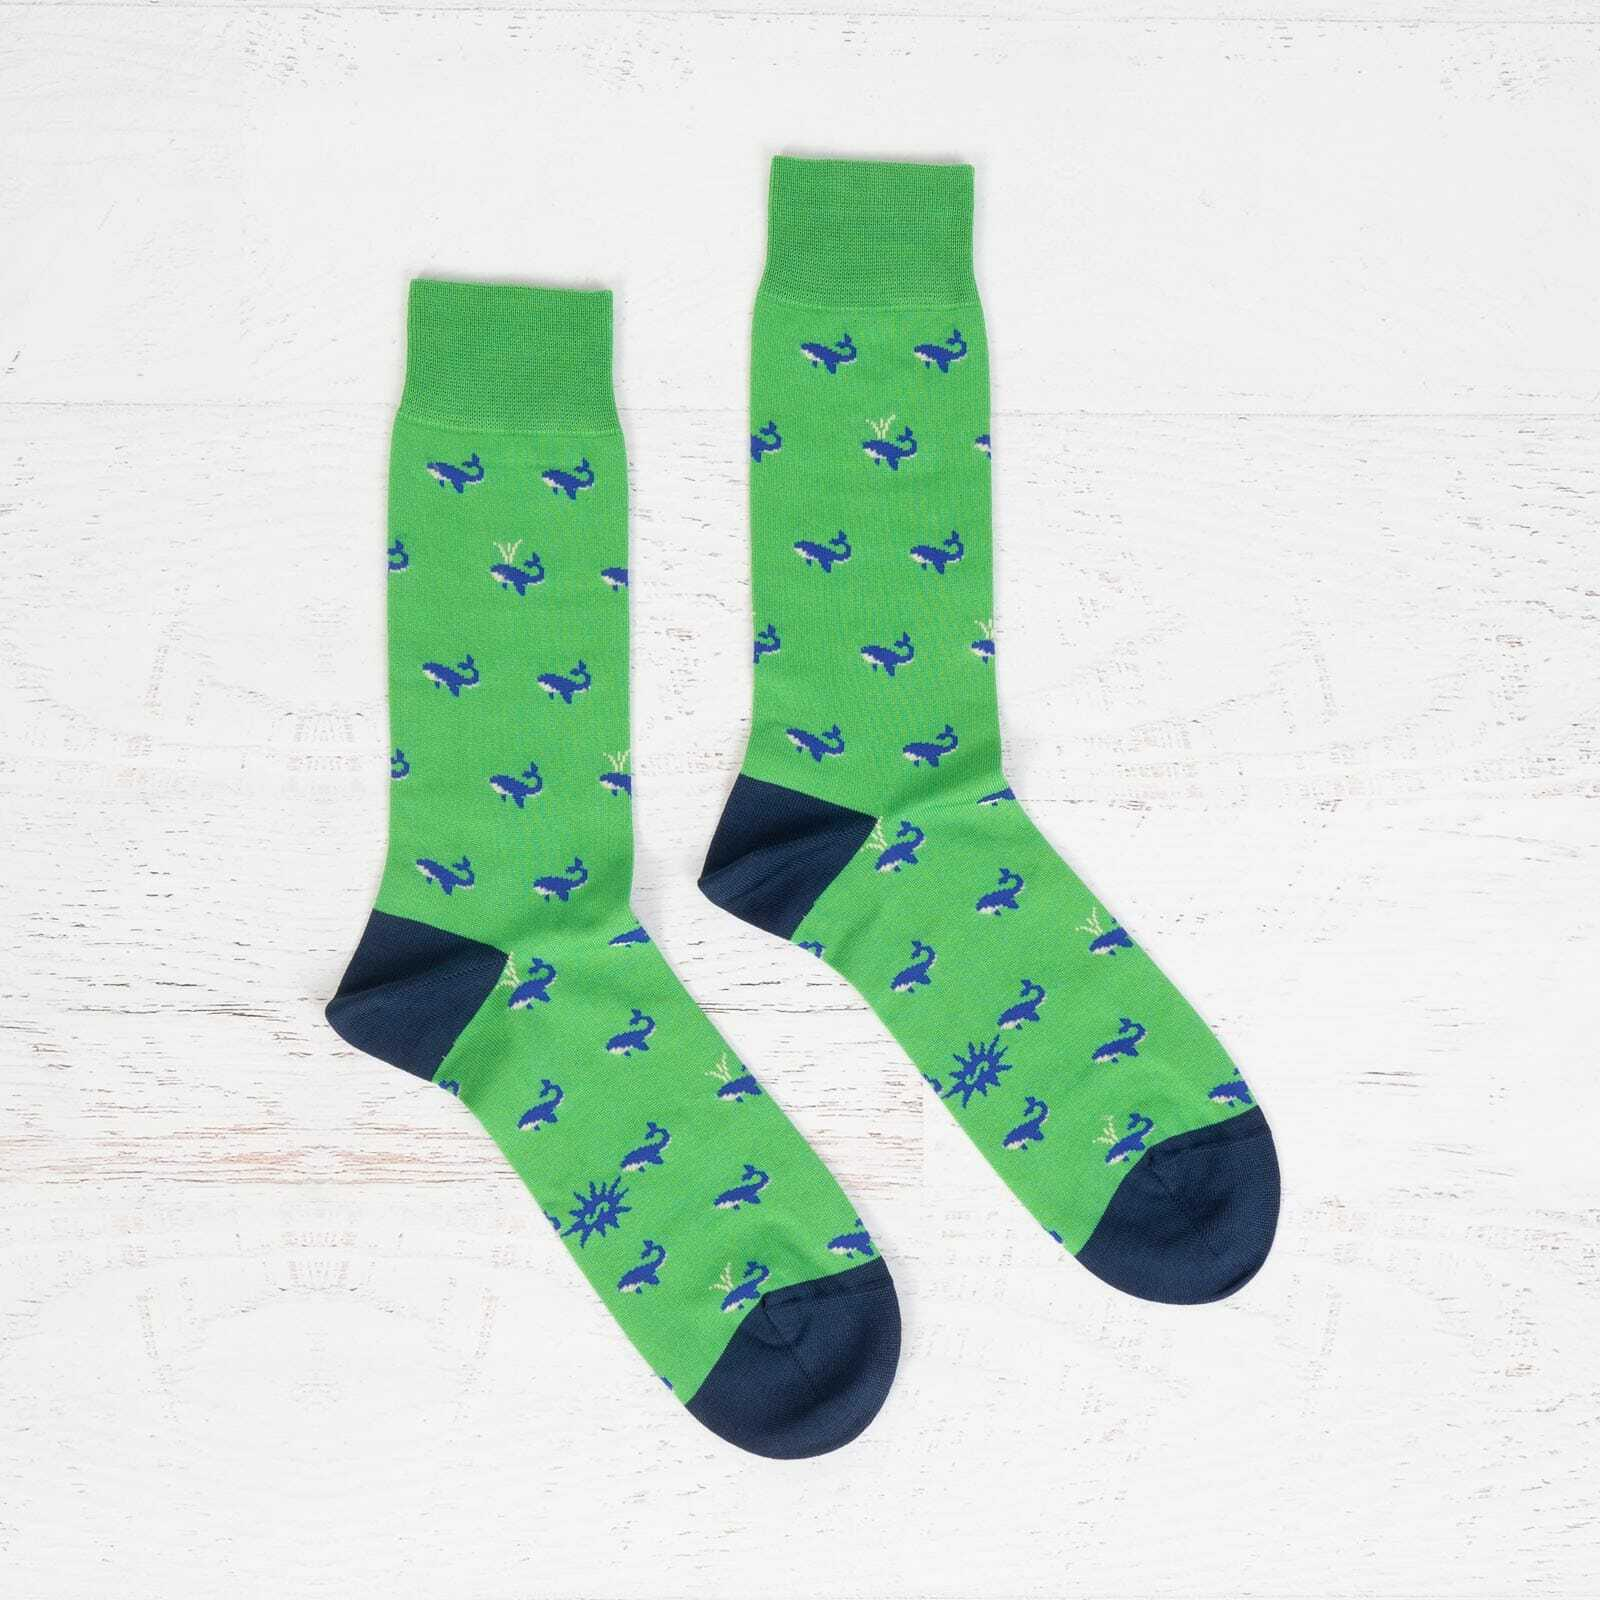 Men's Luxe Whale Dress Socks in Coral